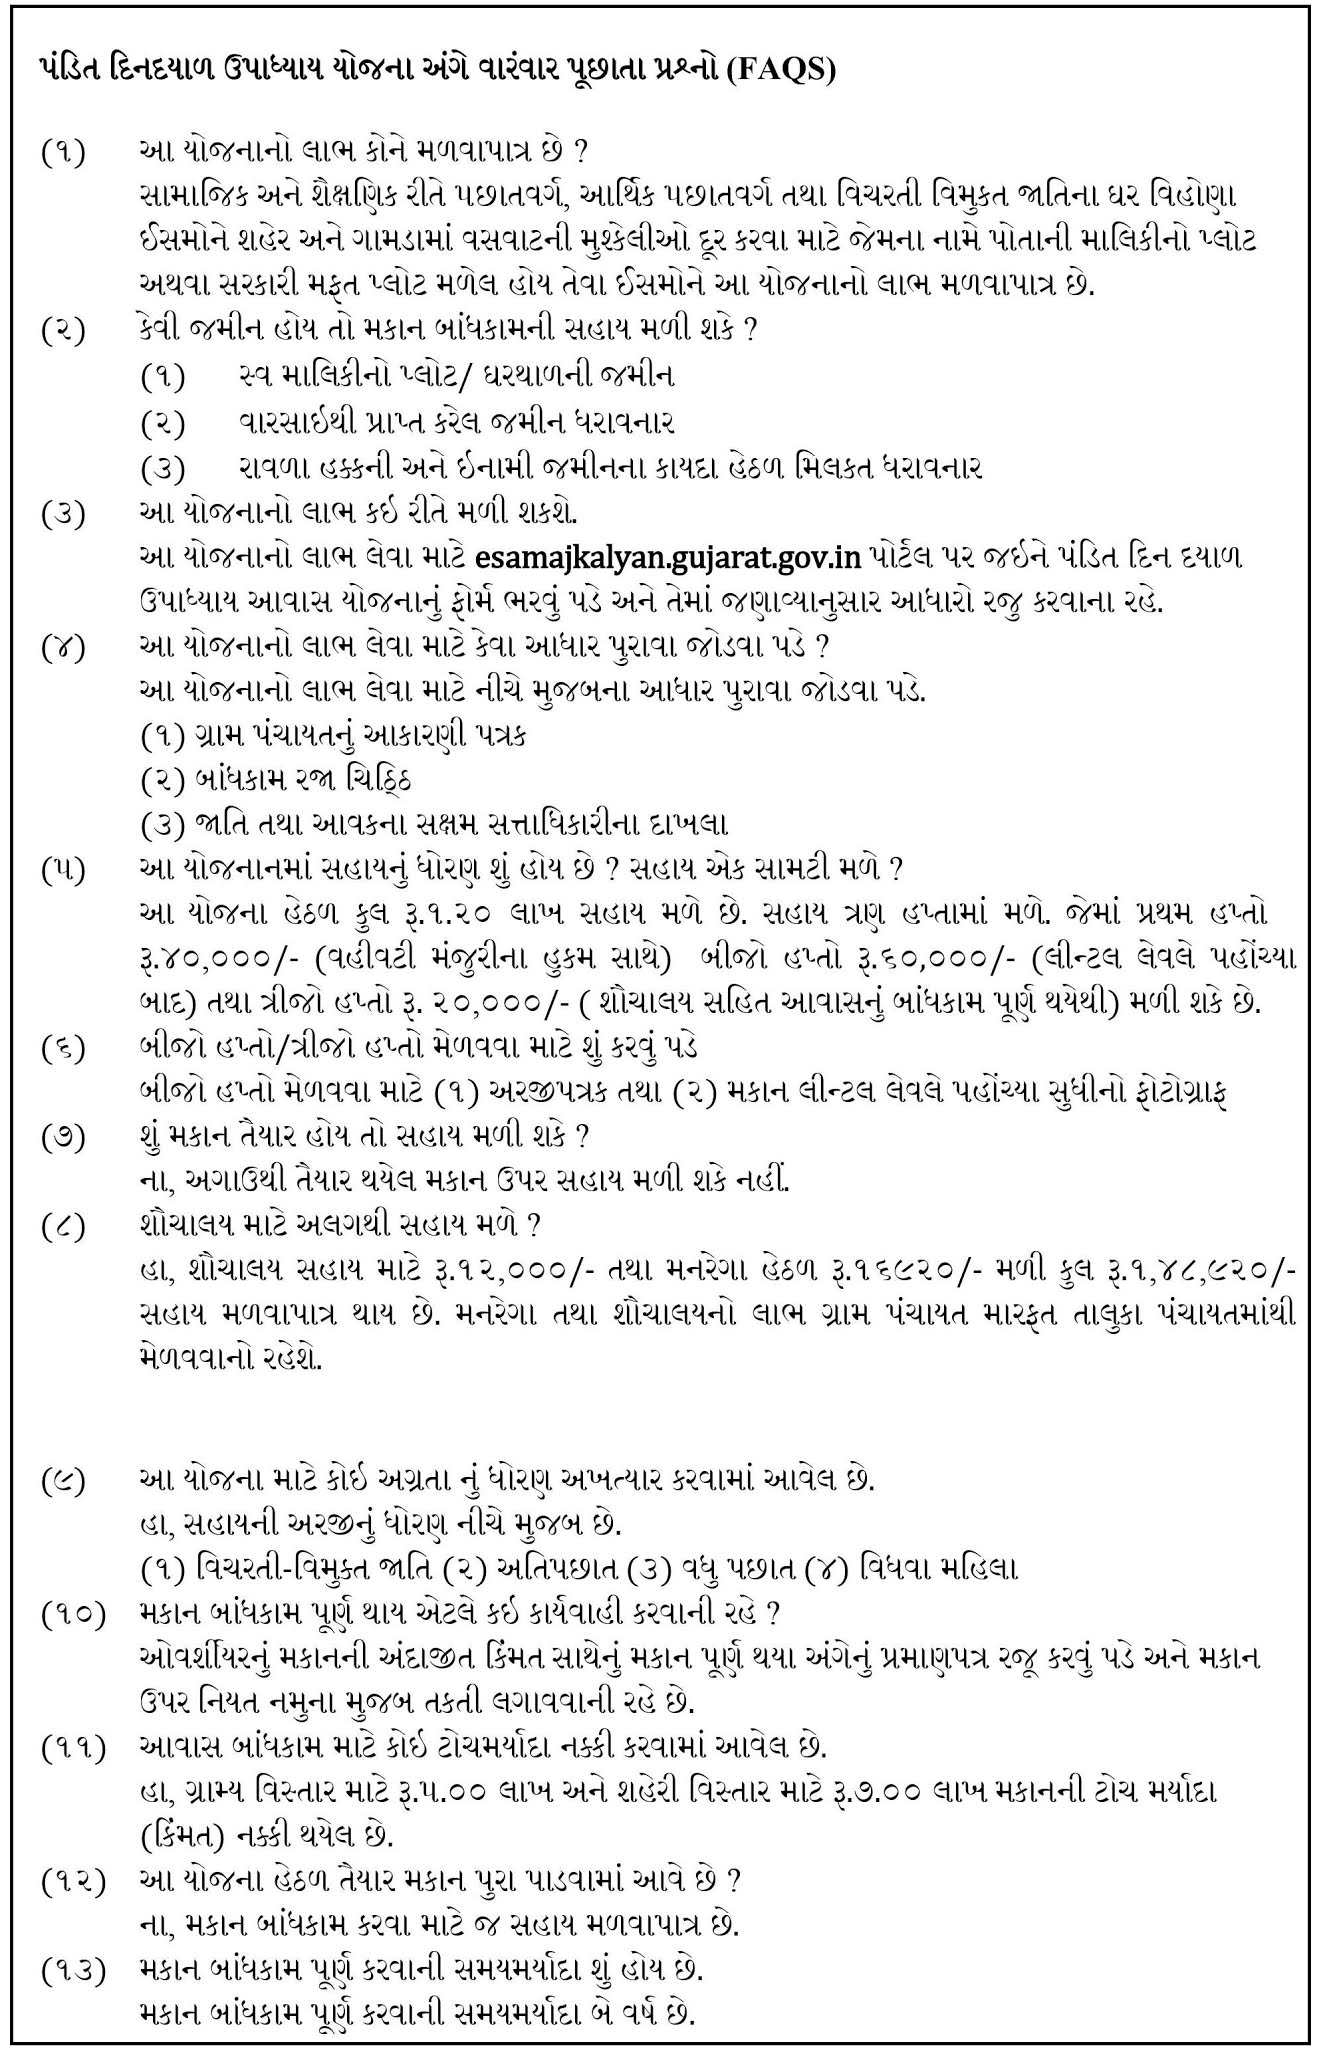 Pandit Din Dayal Upadhyay Awas Yojana - Gujarat Makan Sahay Yojana: 2021-22